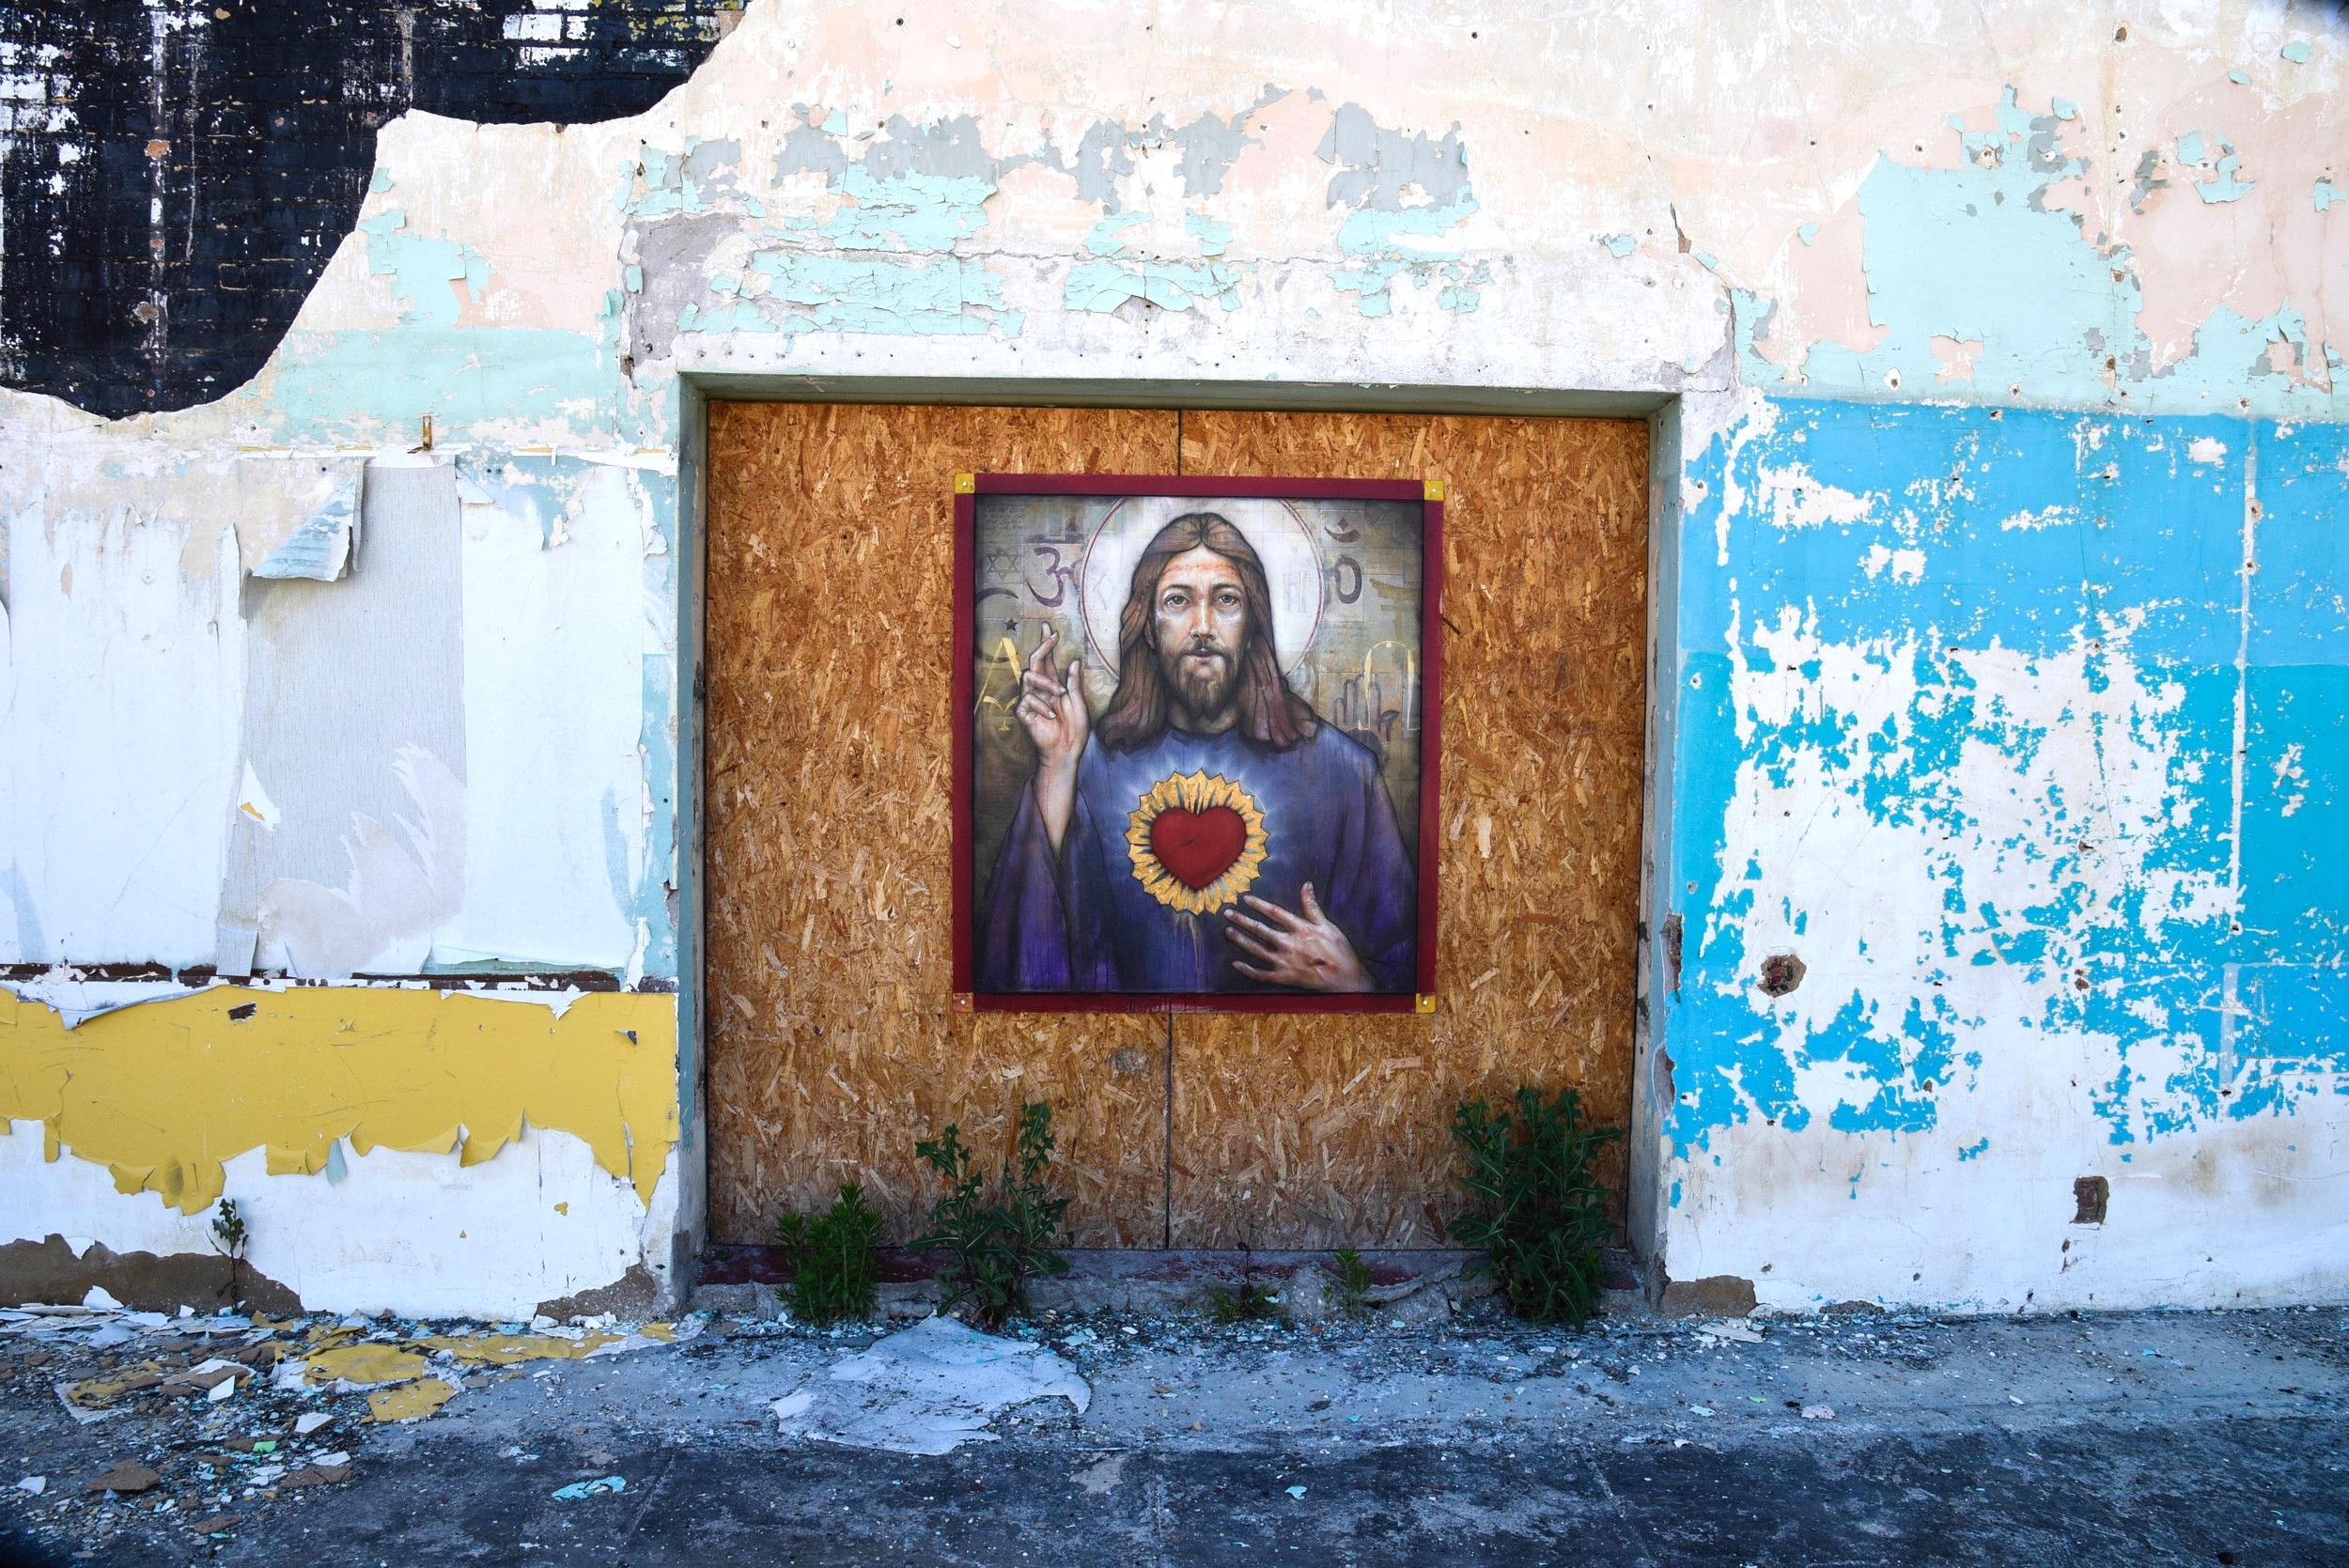 Universal Christ, Princeton, West Virginia. 2016.